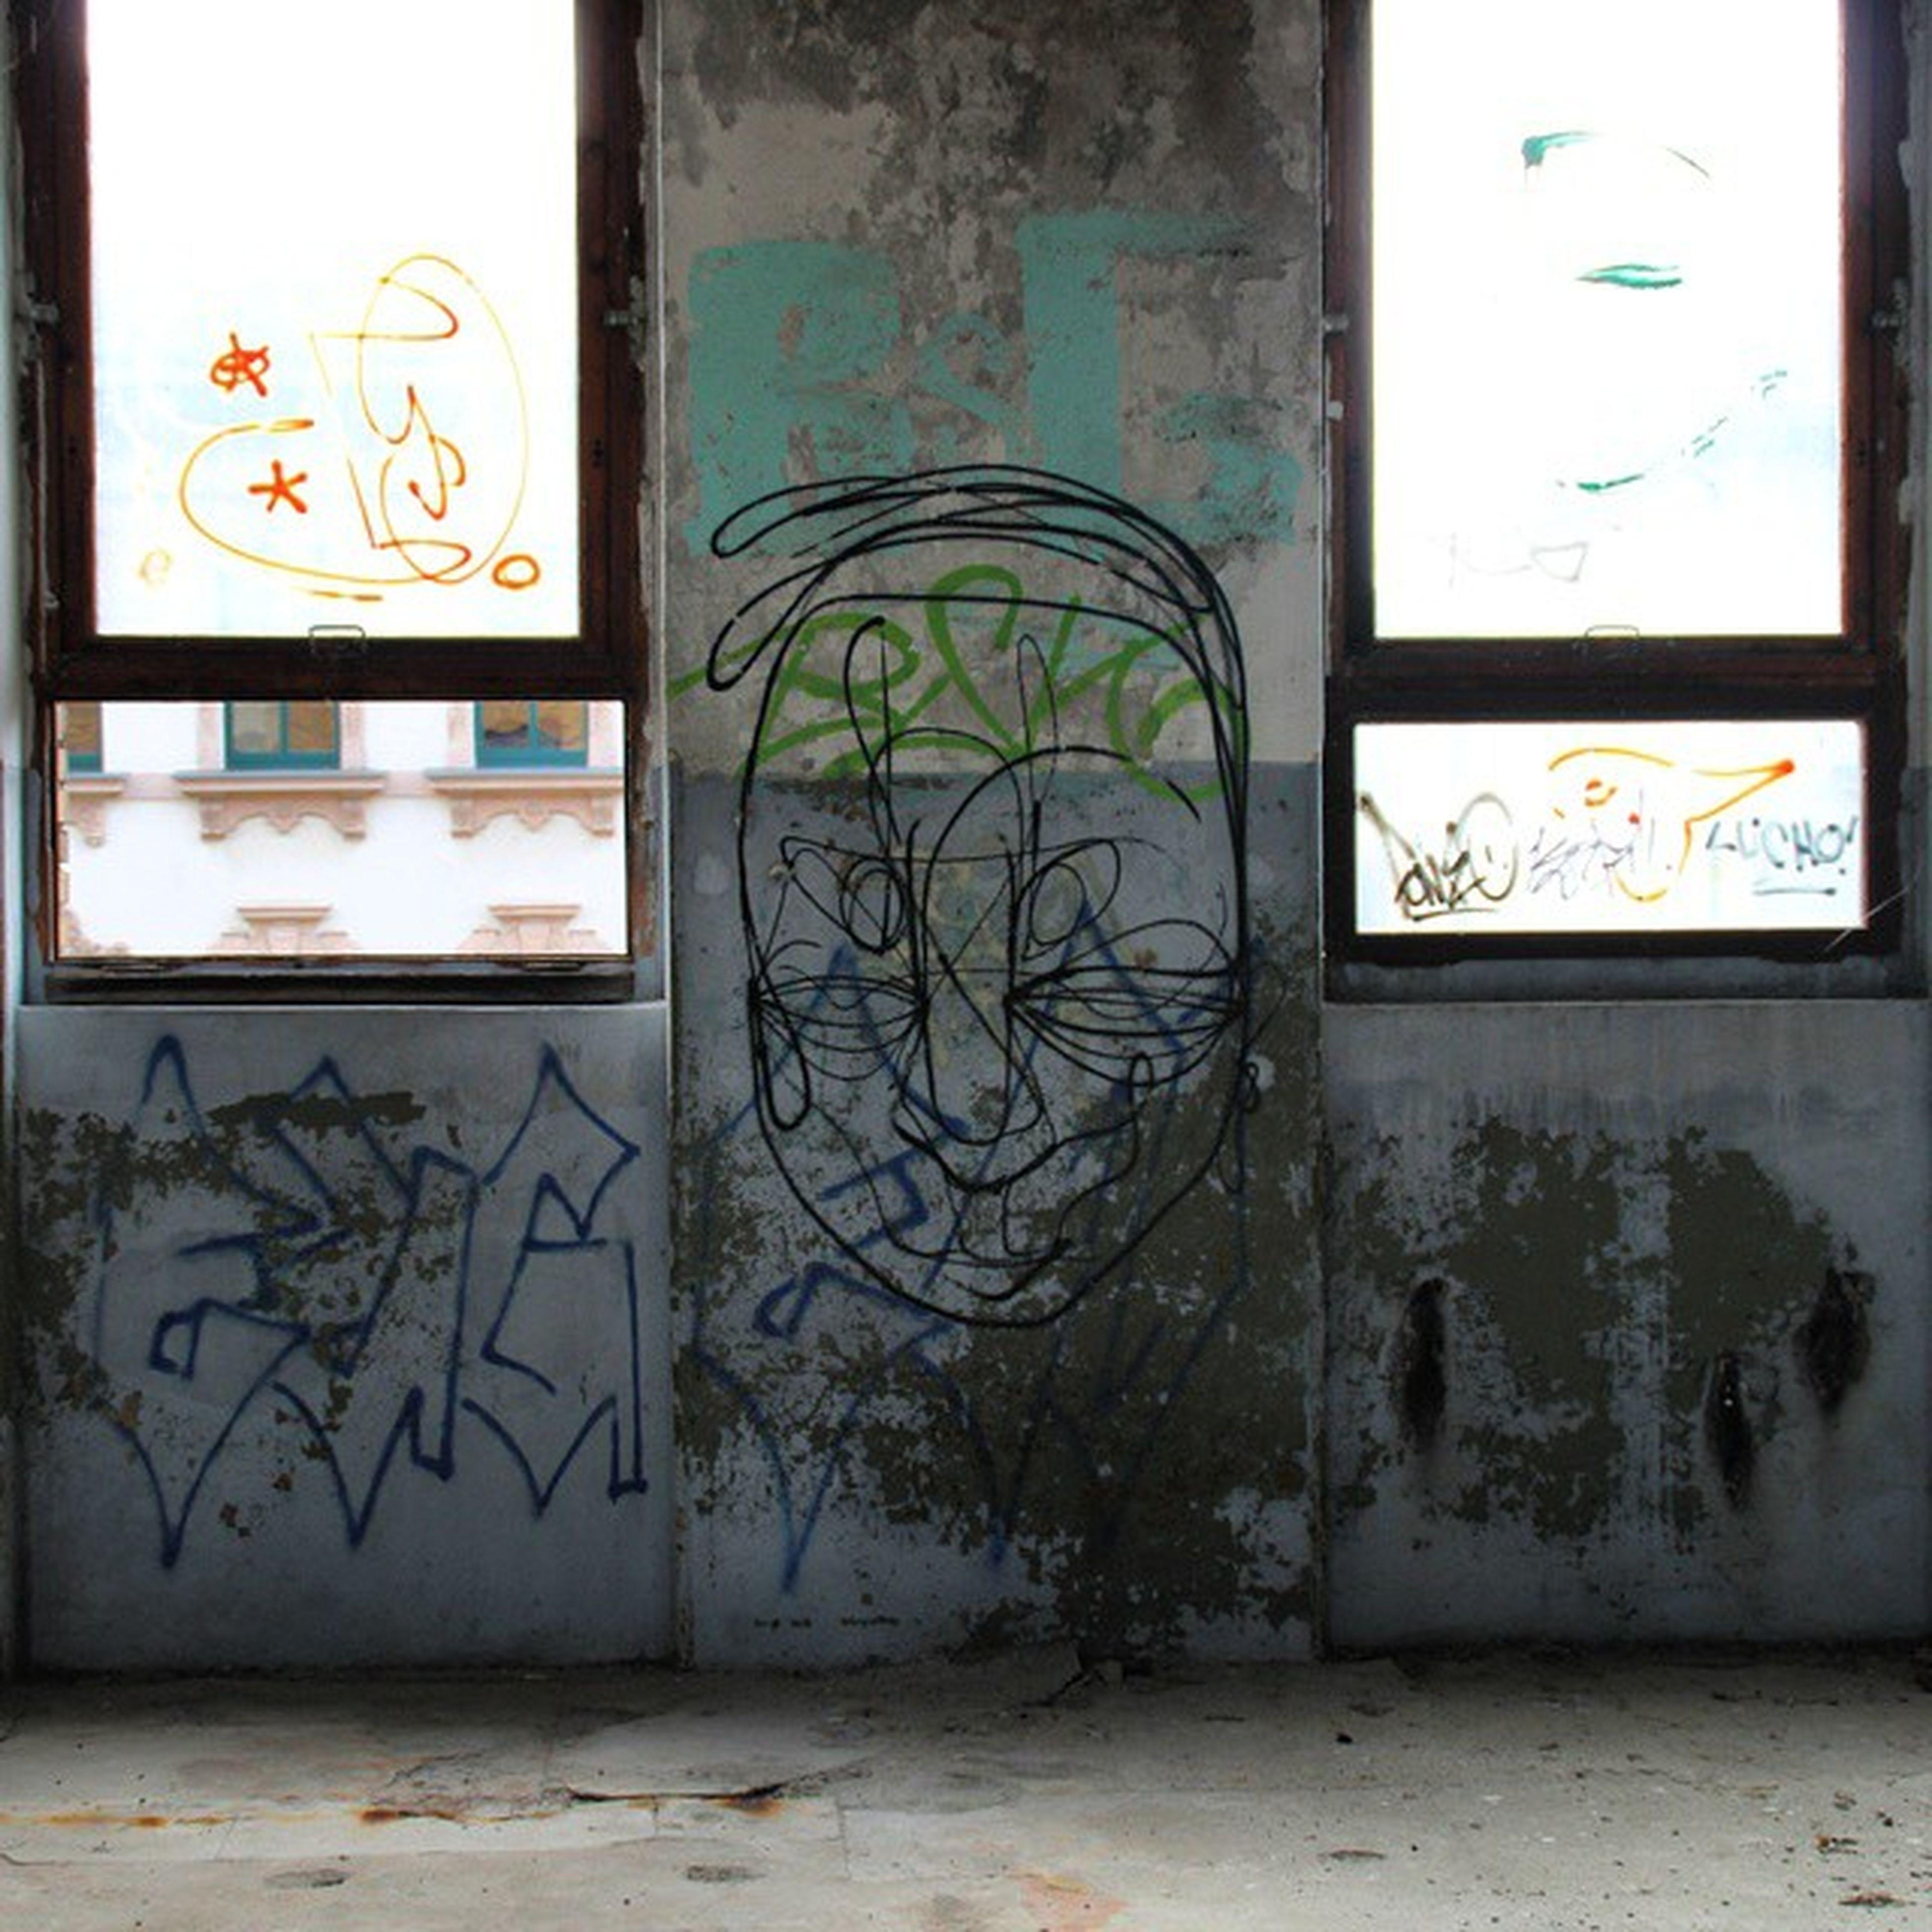 graffiti, art, art and craft, creativity, wall - building feature, built structure, architecture, wall, building exterior, street art, text, door, mural, human representation, multi colored, western script, window, design, animal representation, closed